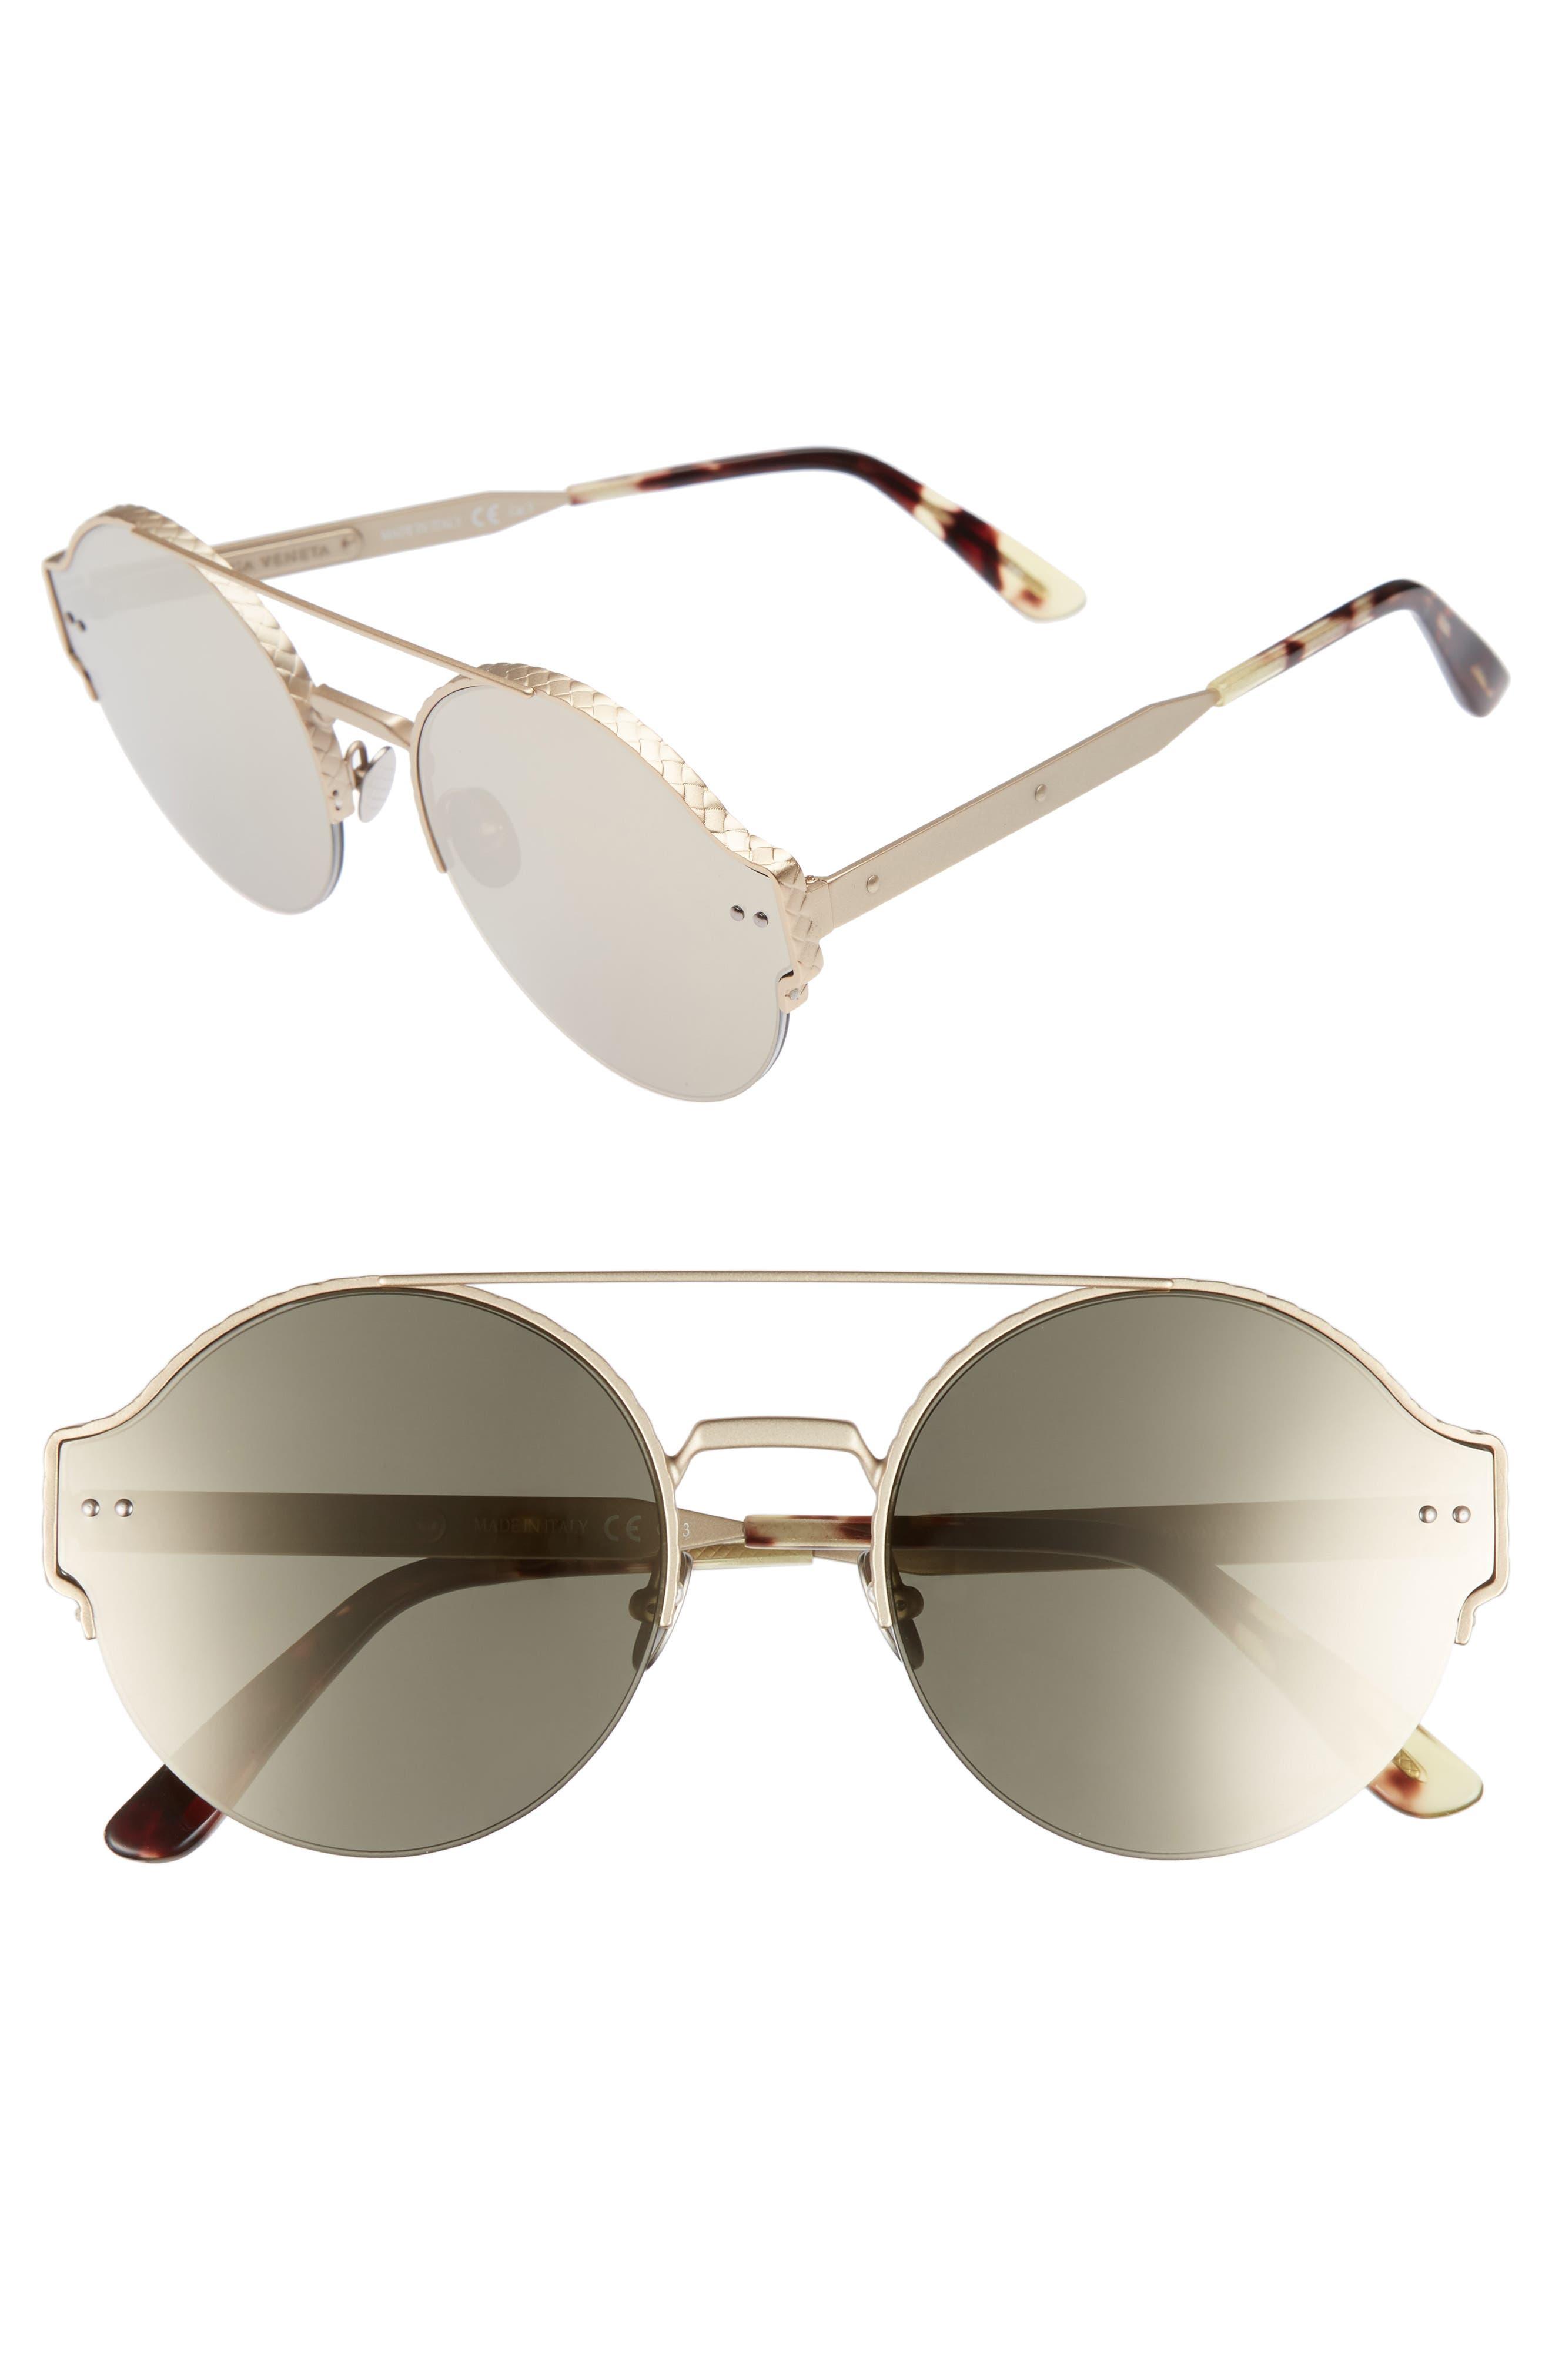 54mm Round Semi-Rimless Sunglasses,                             Main thumbnail 2, color,